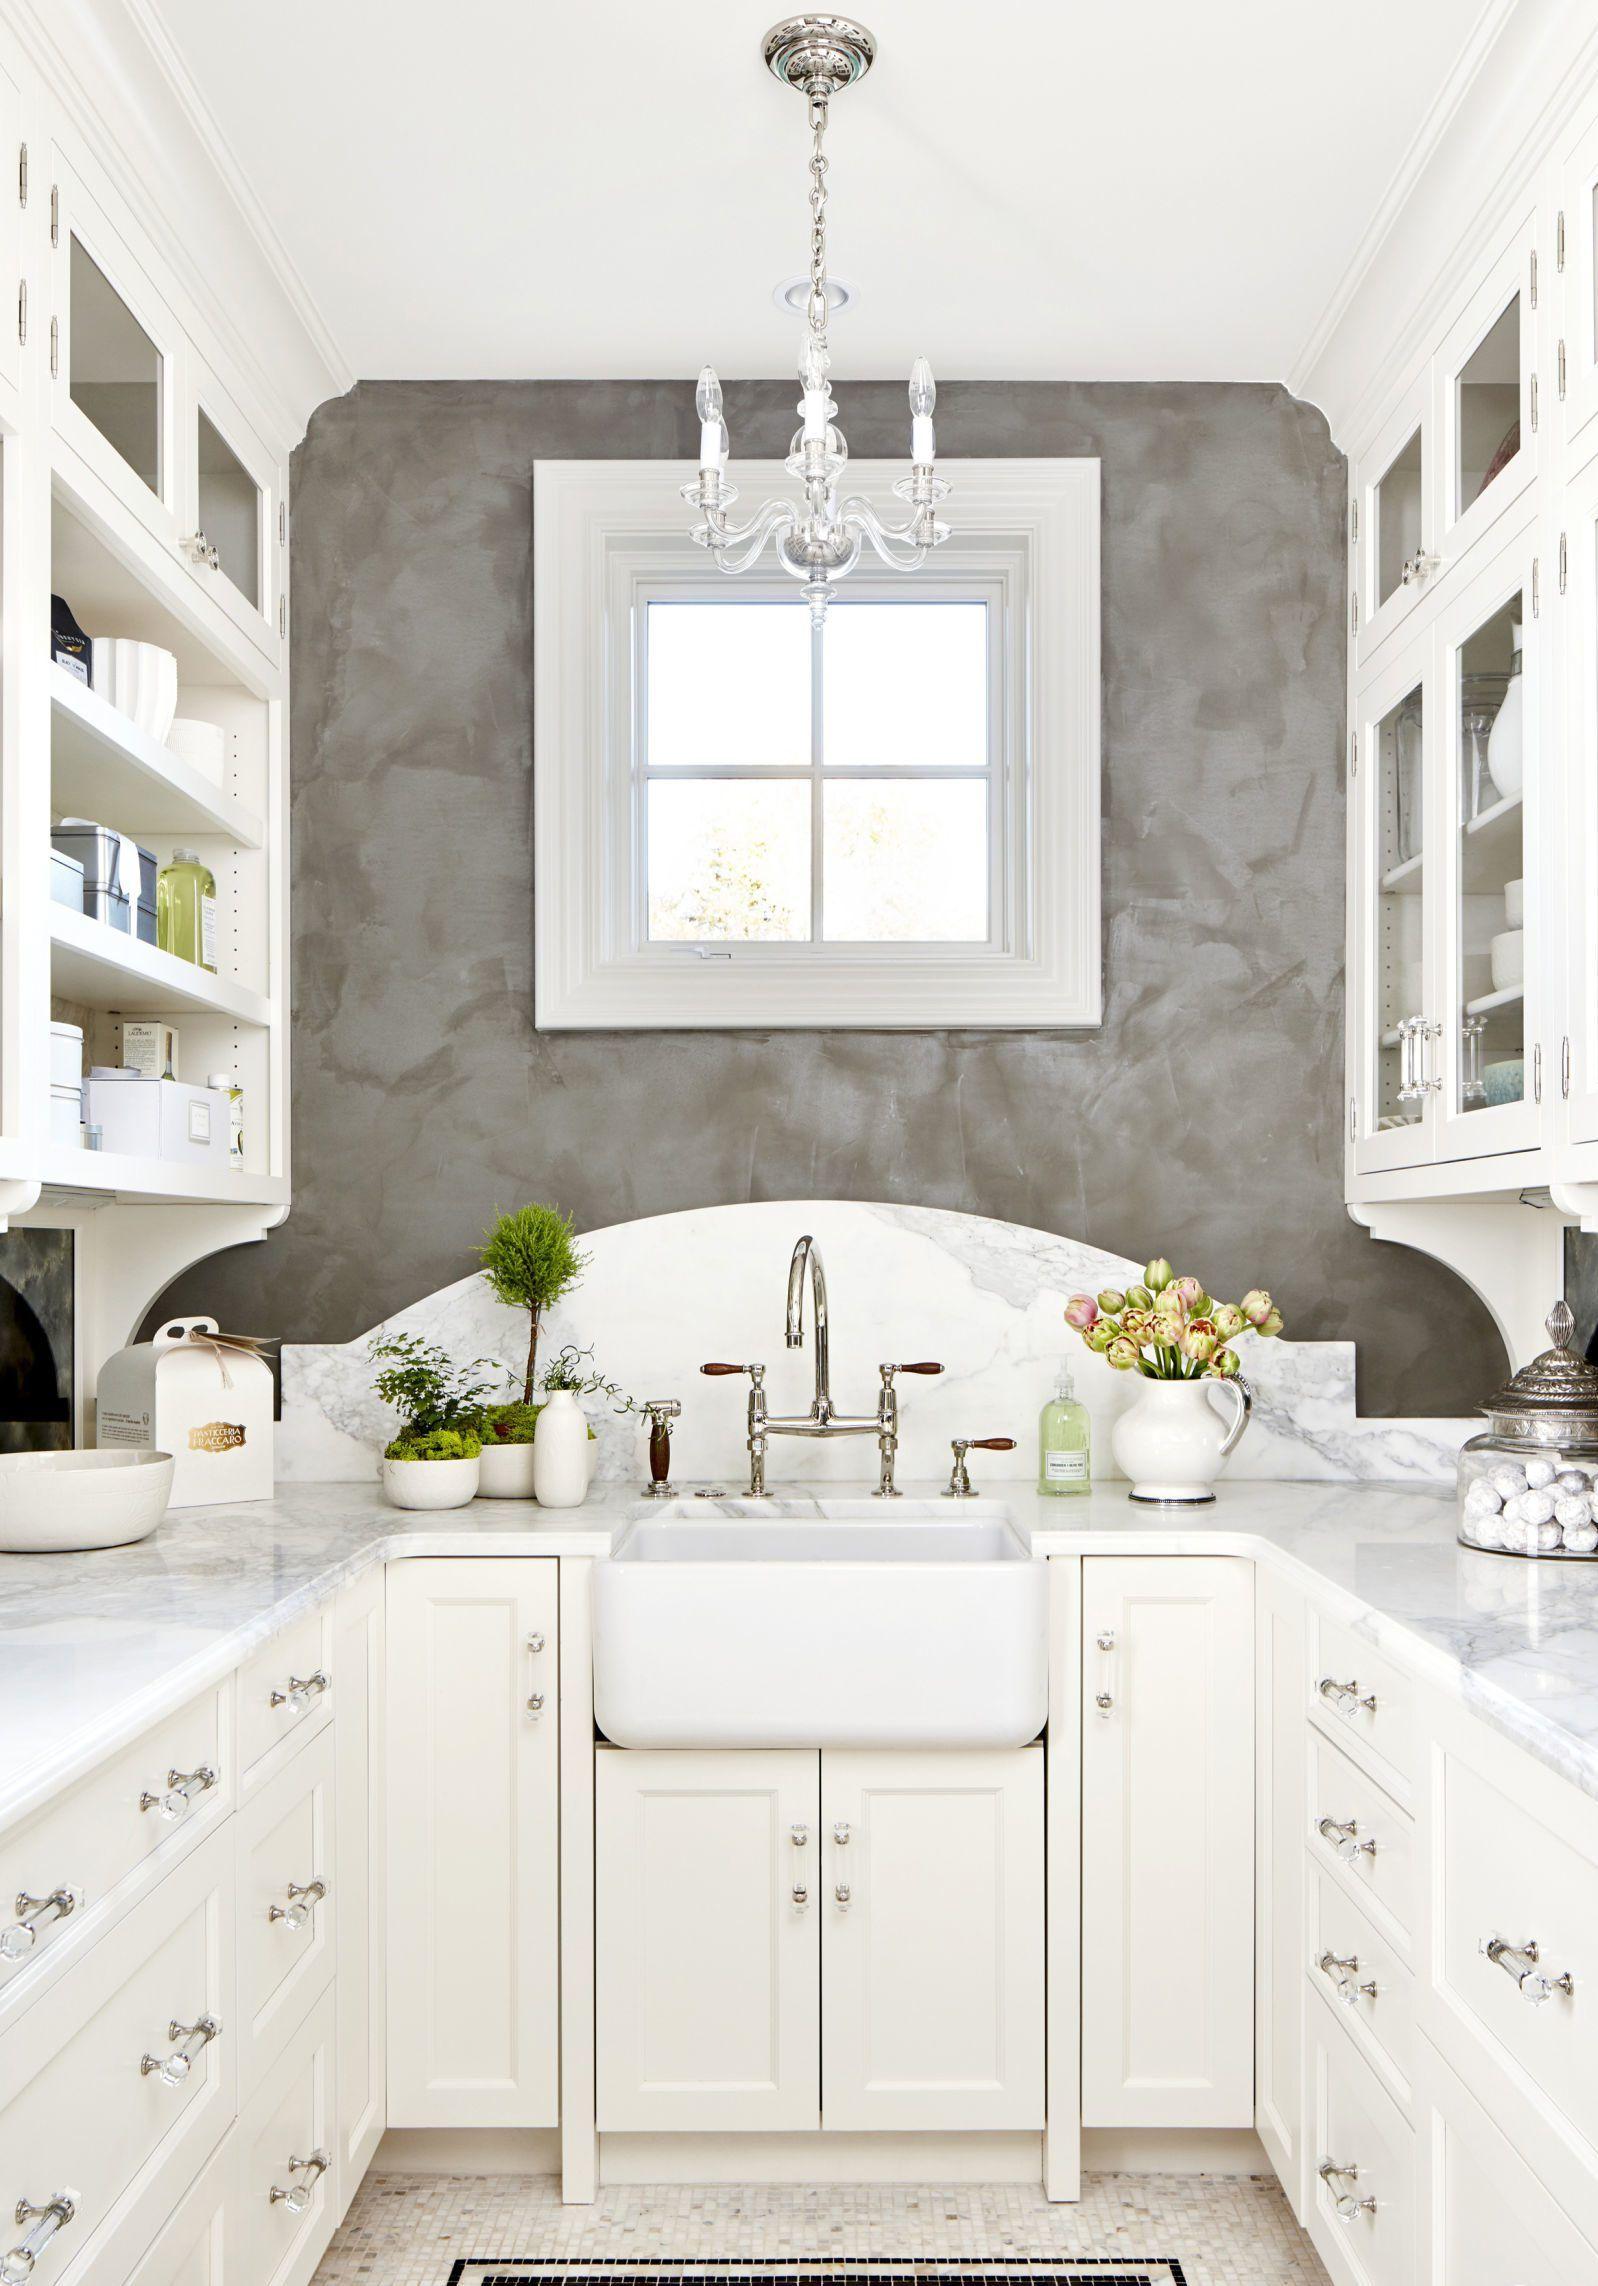 White galley kitchen small kitchen ideas Home Decor Ideas in